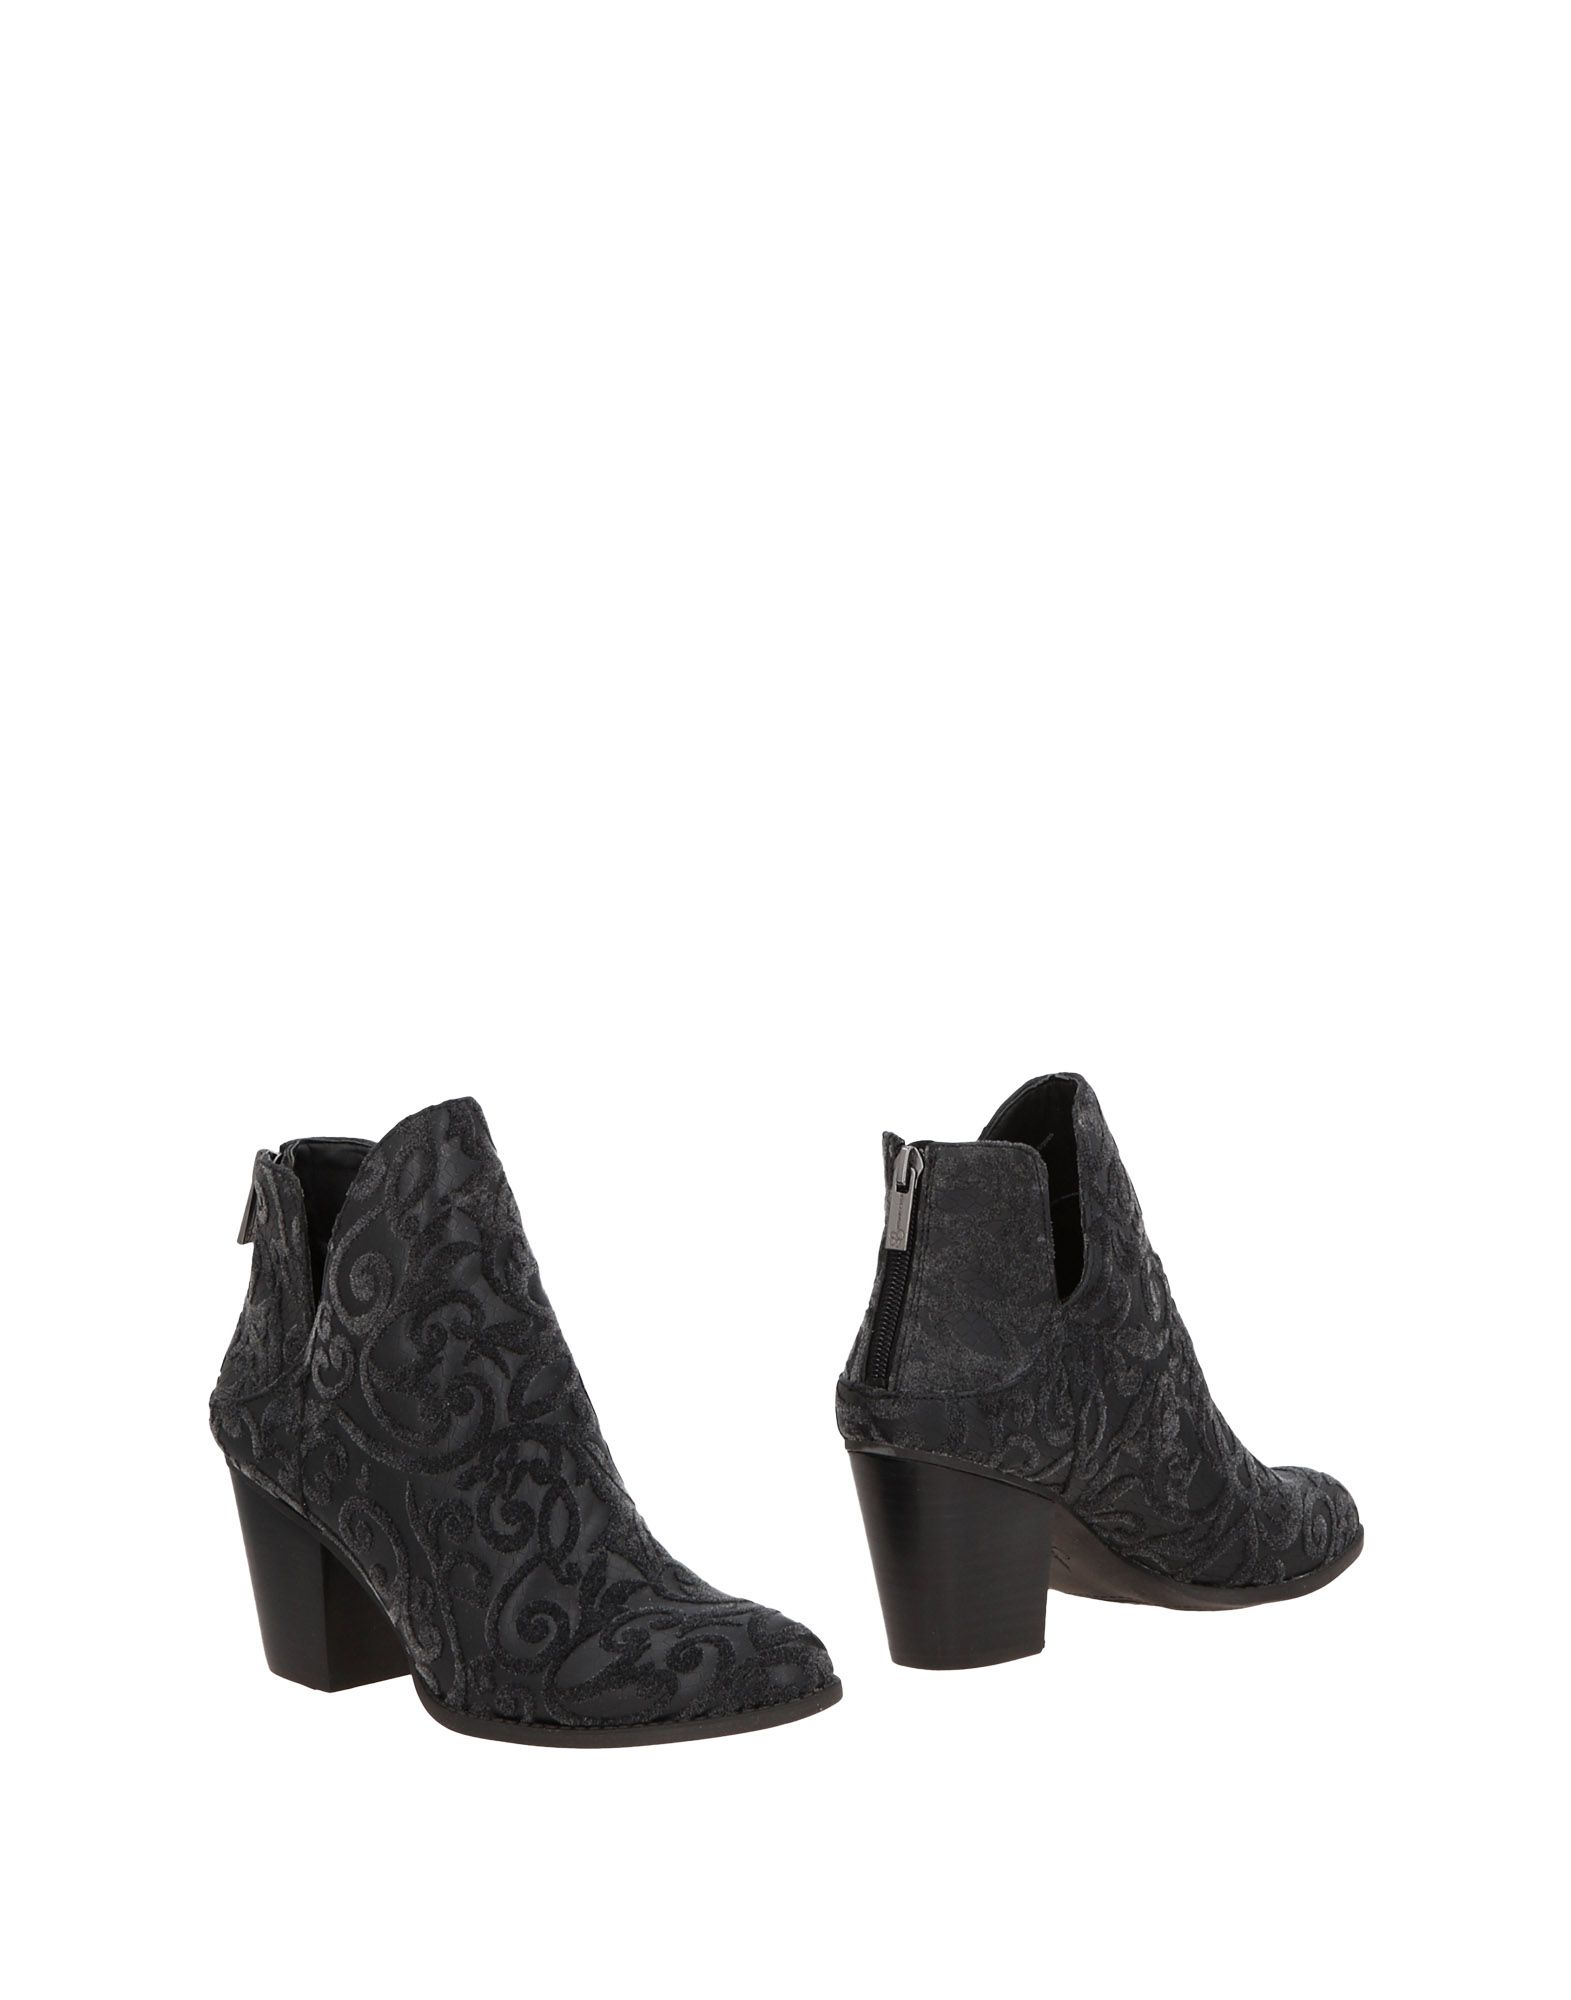 Jessica Simpson Ankle Simpson Boot - Women Jessica Simpson Ankle Ankle Boots online on  Australia - 11479262EW f9582d